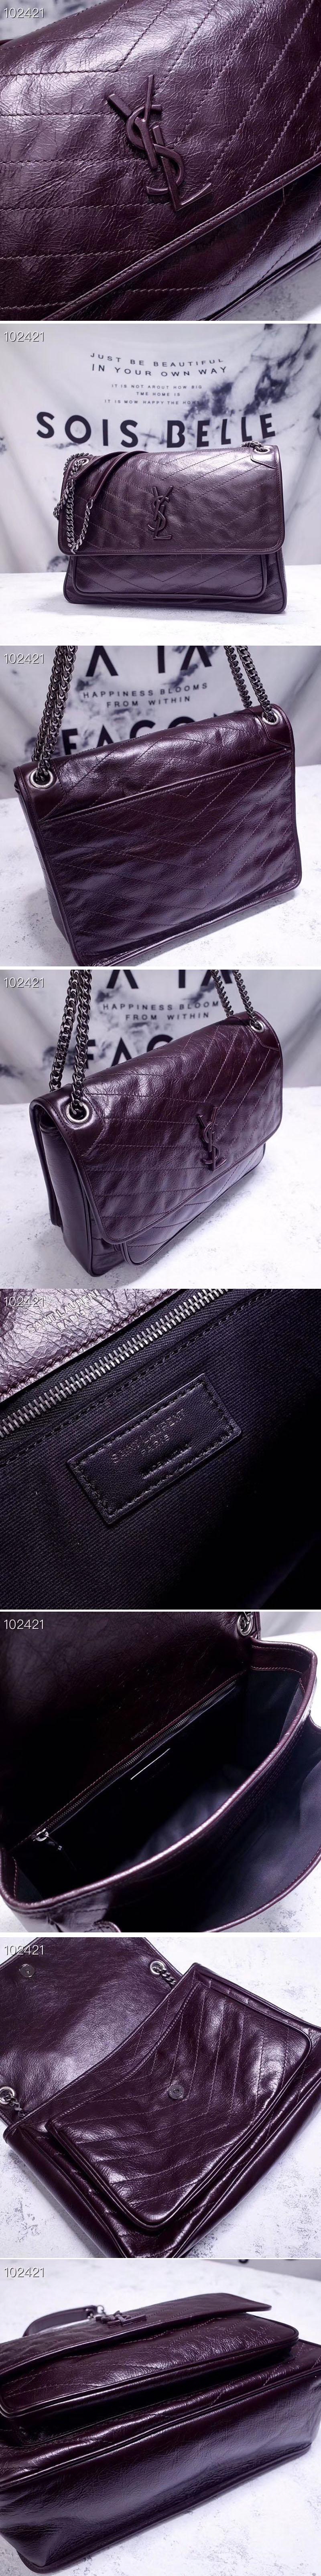 Ysl Saint Laurent Niki Large Bag Vintage Leather 498883